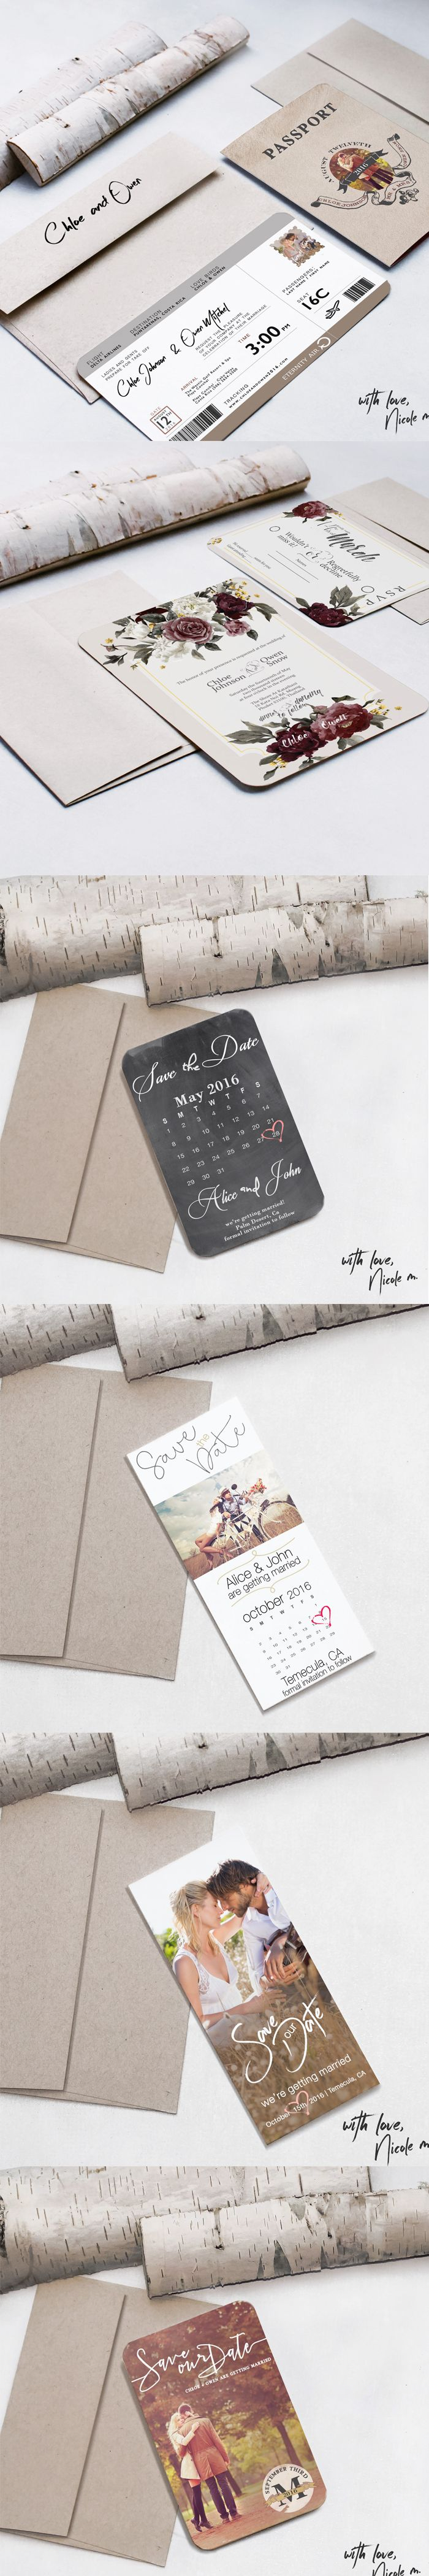 Beautiful Wedding invitation and save the dates